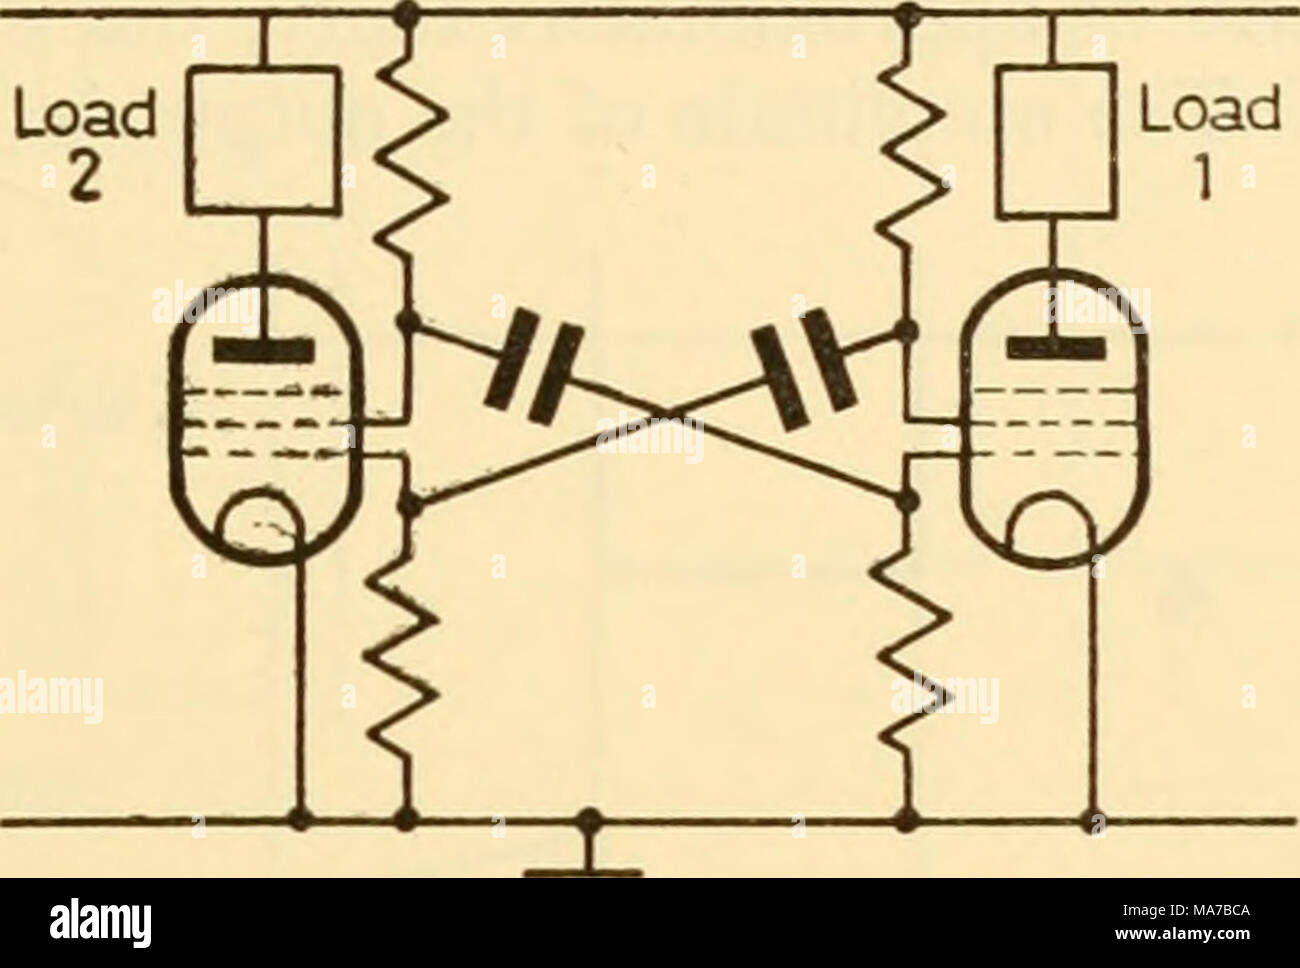 Amplifier Circuit Stockfotos & Amplifier Circuit Bilder - Seite 3 ...